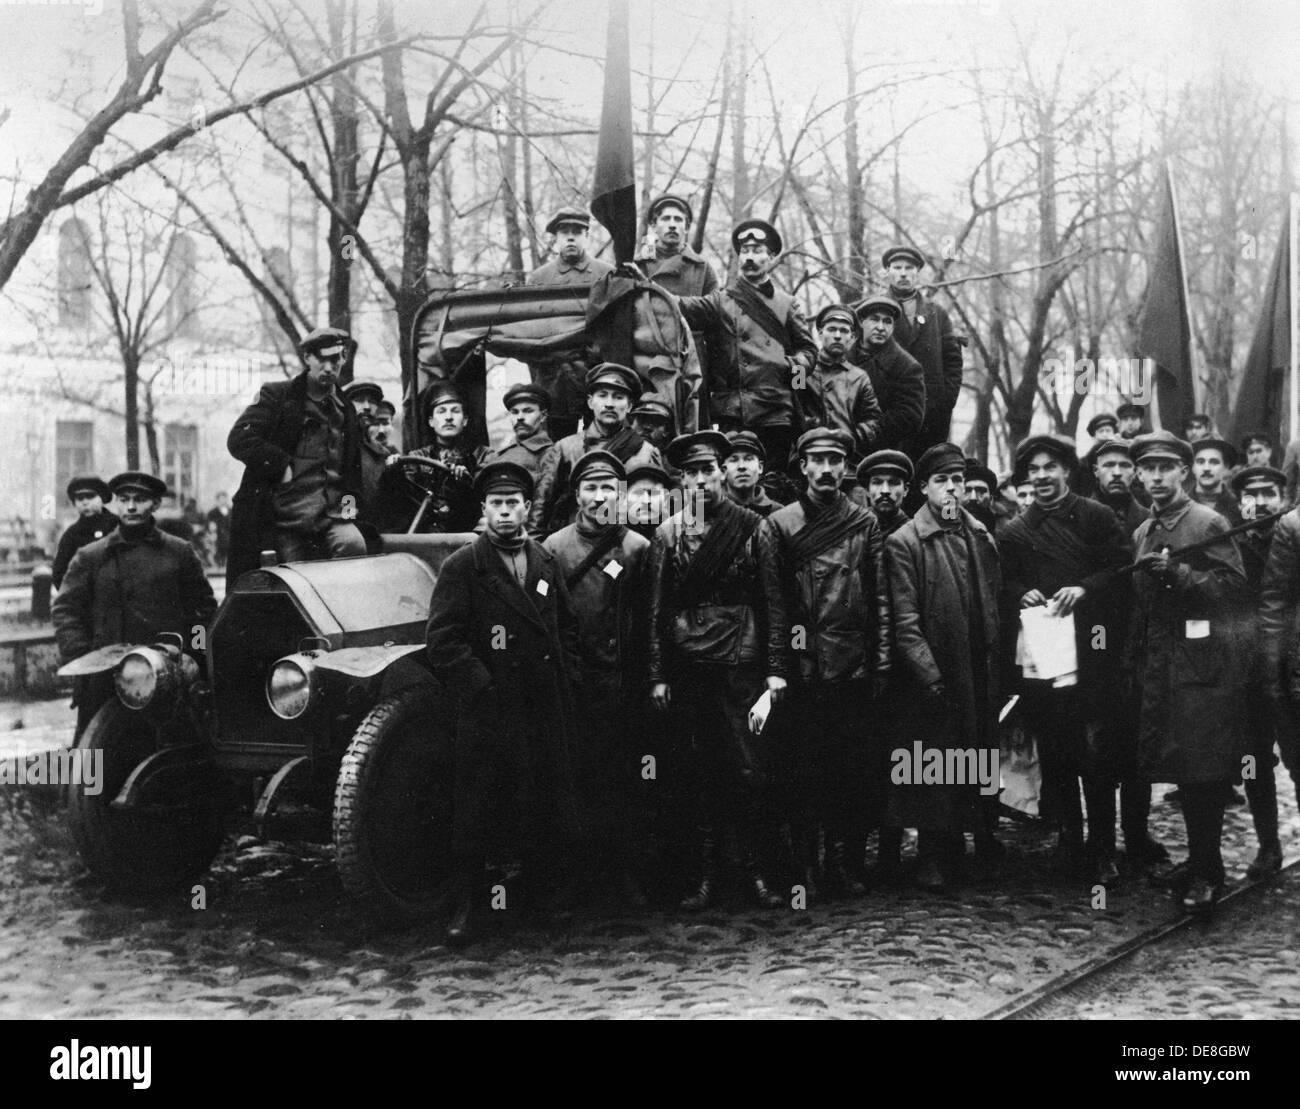 A Group of Red Army Men. Petrograd, 1917. Artist: Bulla, Karl Karlovich (1853-1929) - Stock Image